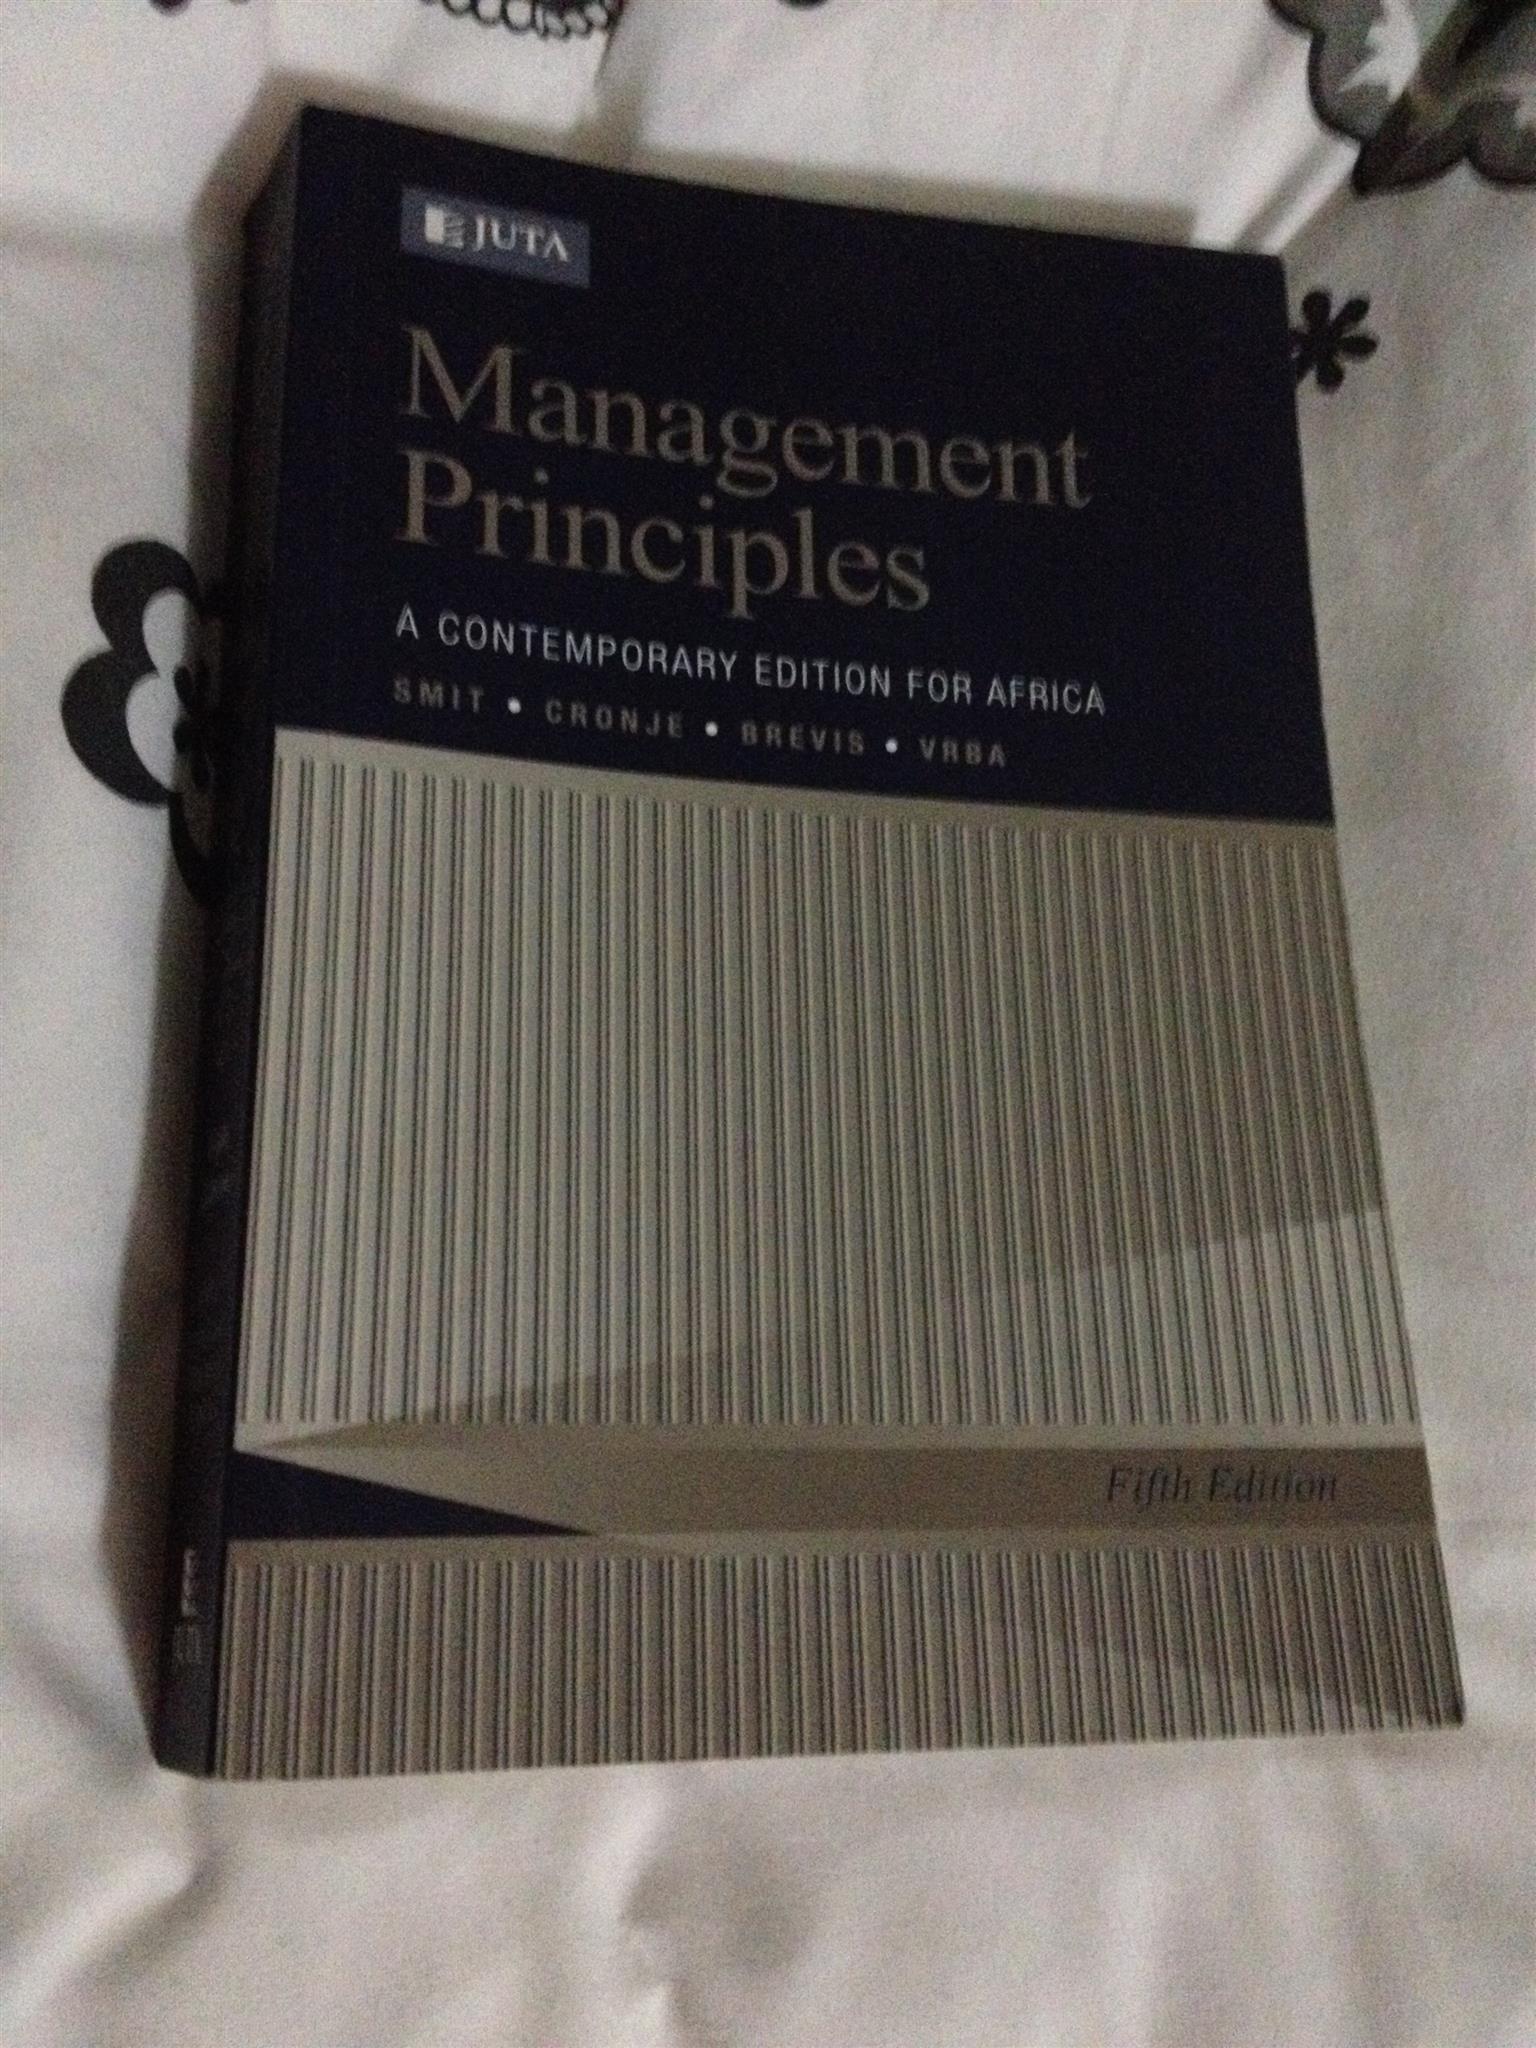 Management principles text book